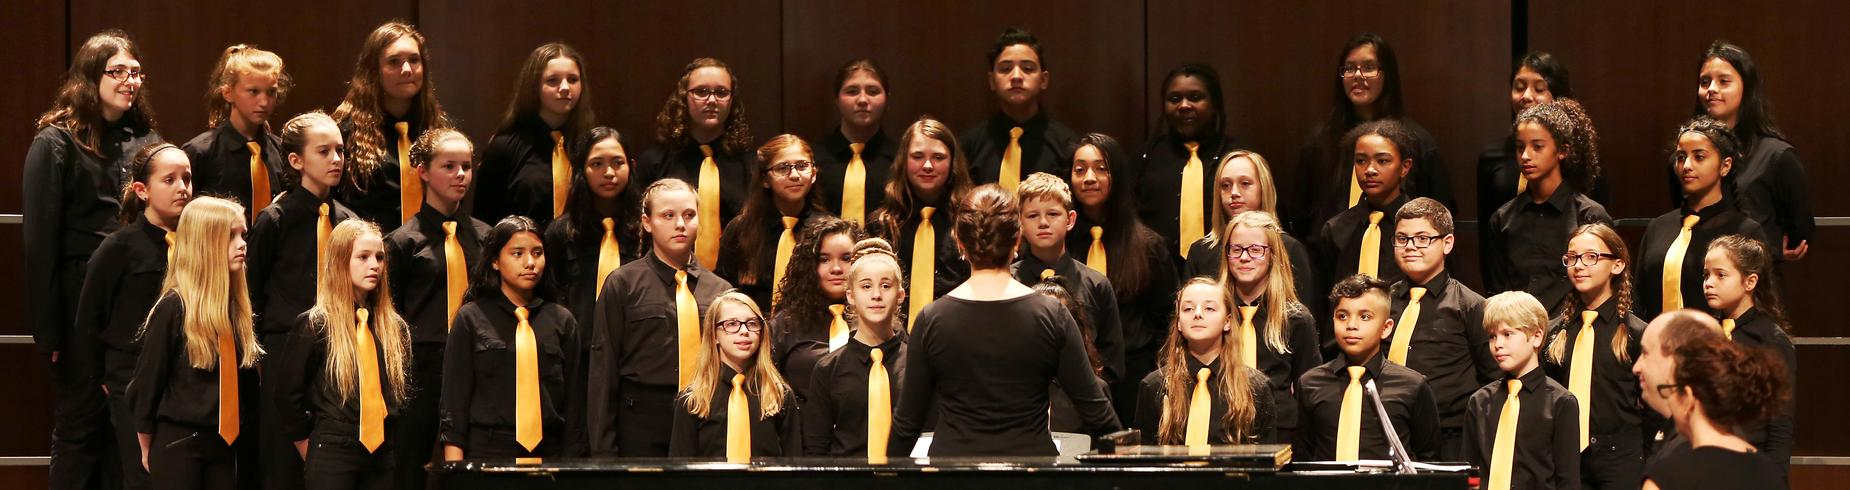 chorus student performance